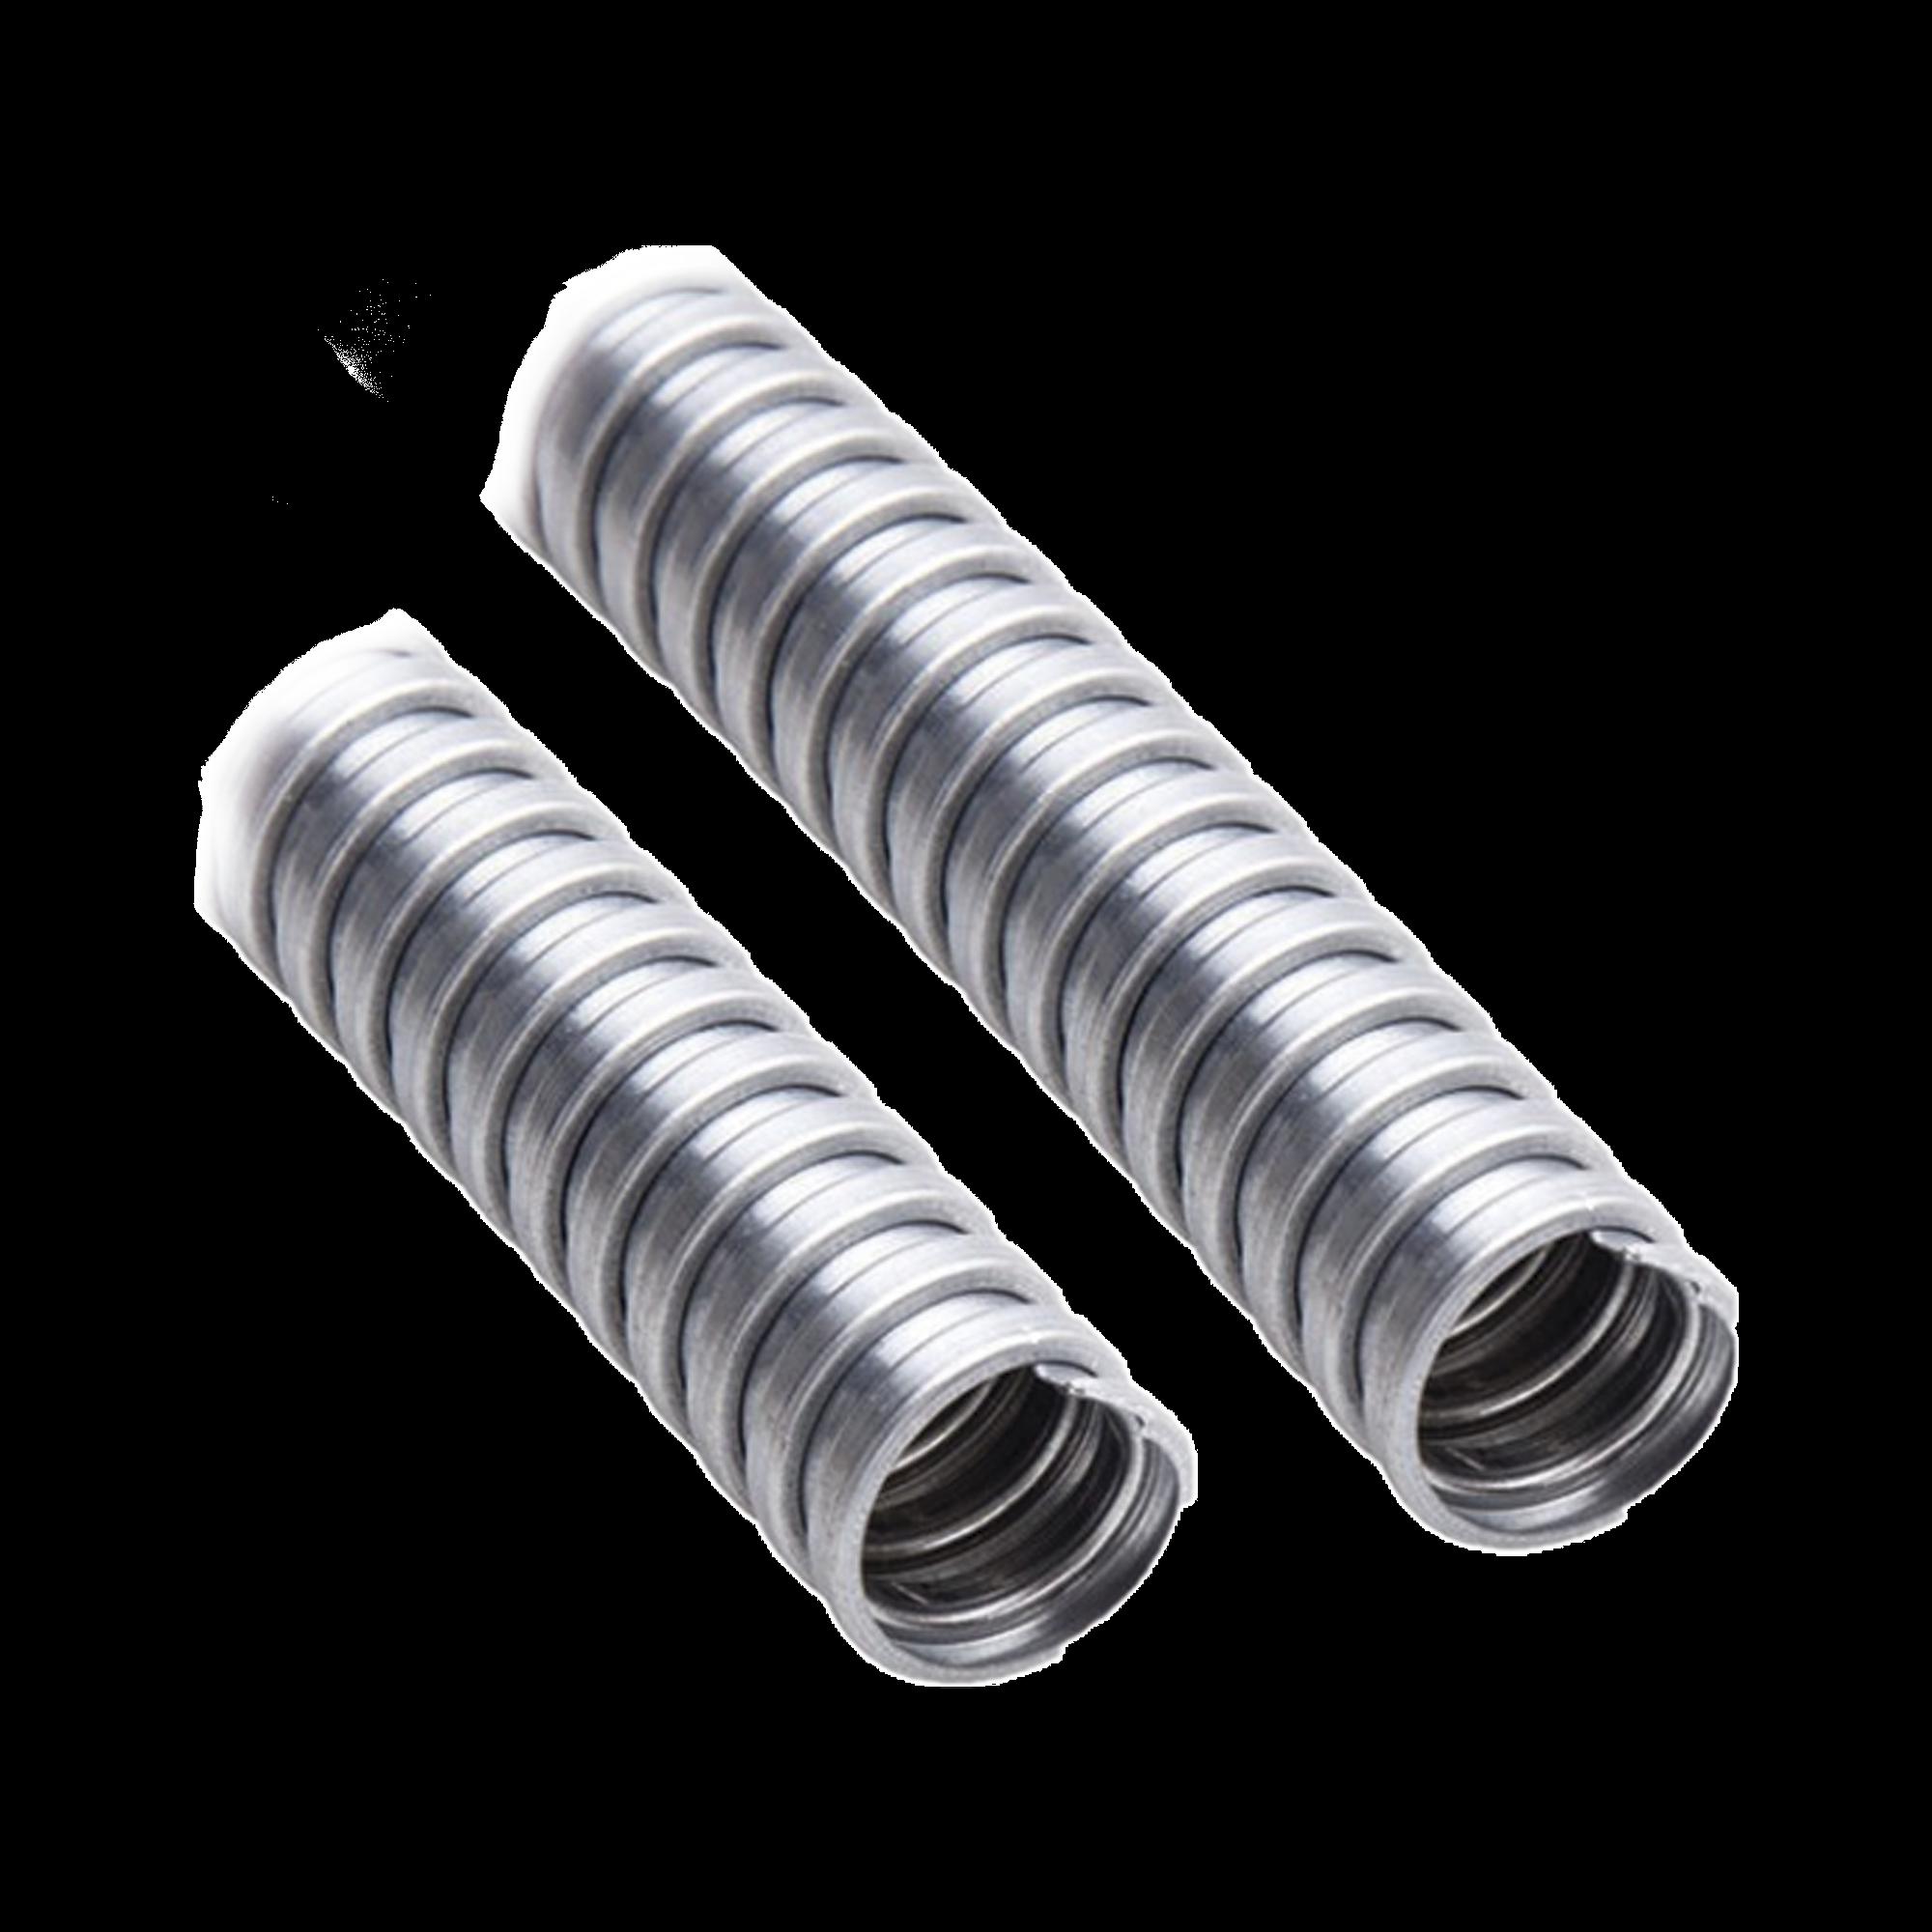 Tubo Flexible galvanizado de 1  (25 mm) Rollo con 30 mts